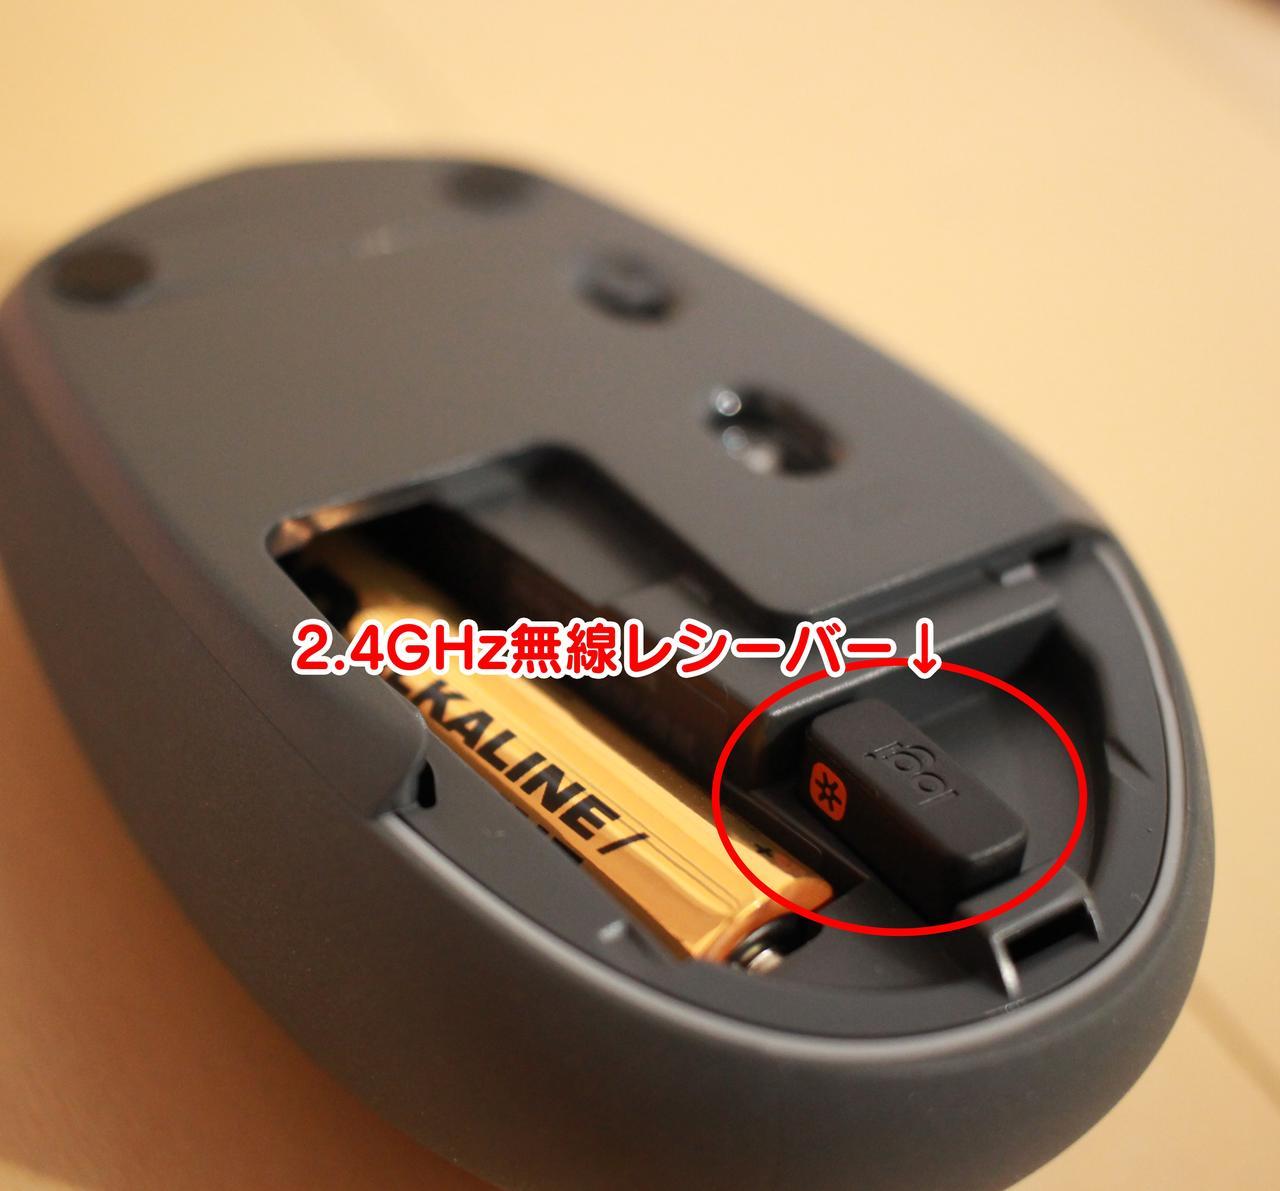 logicoolBluetooth & 2.4GHz無線対応で2台を切り替えながら操作可能